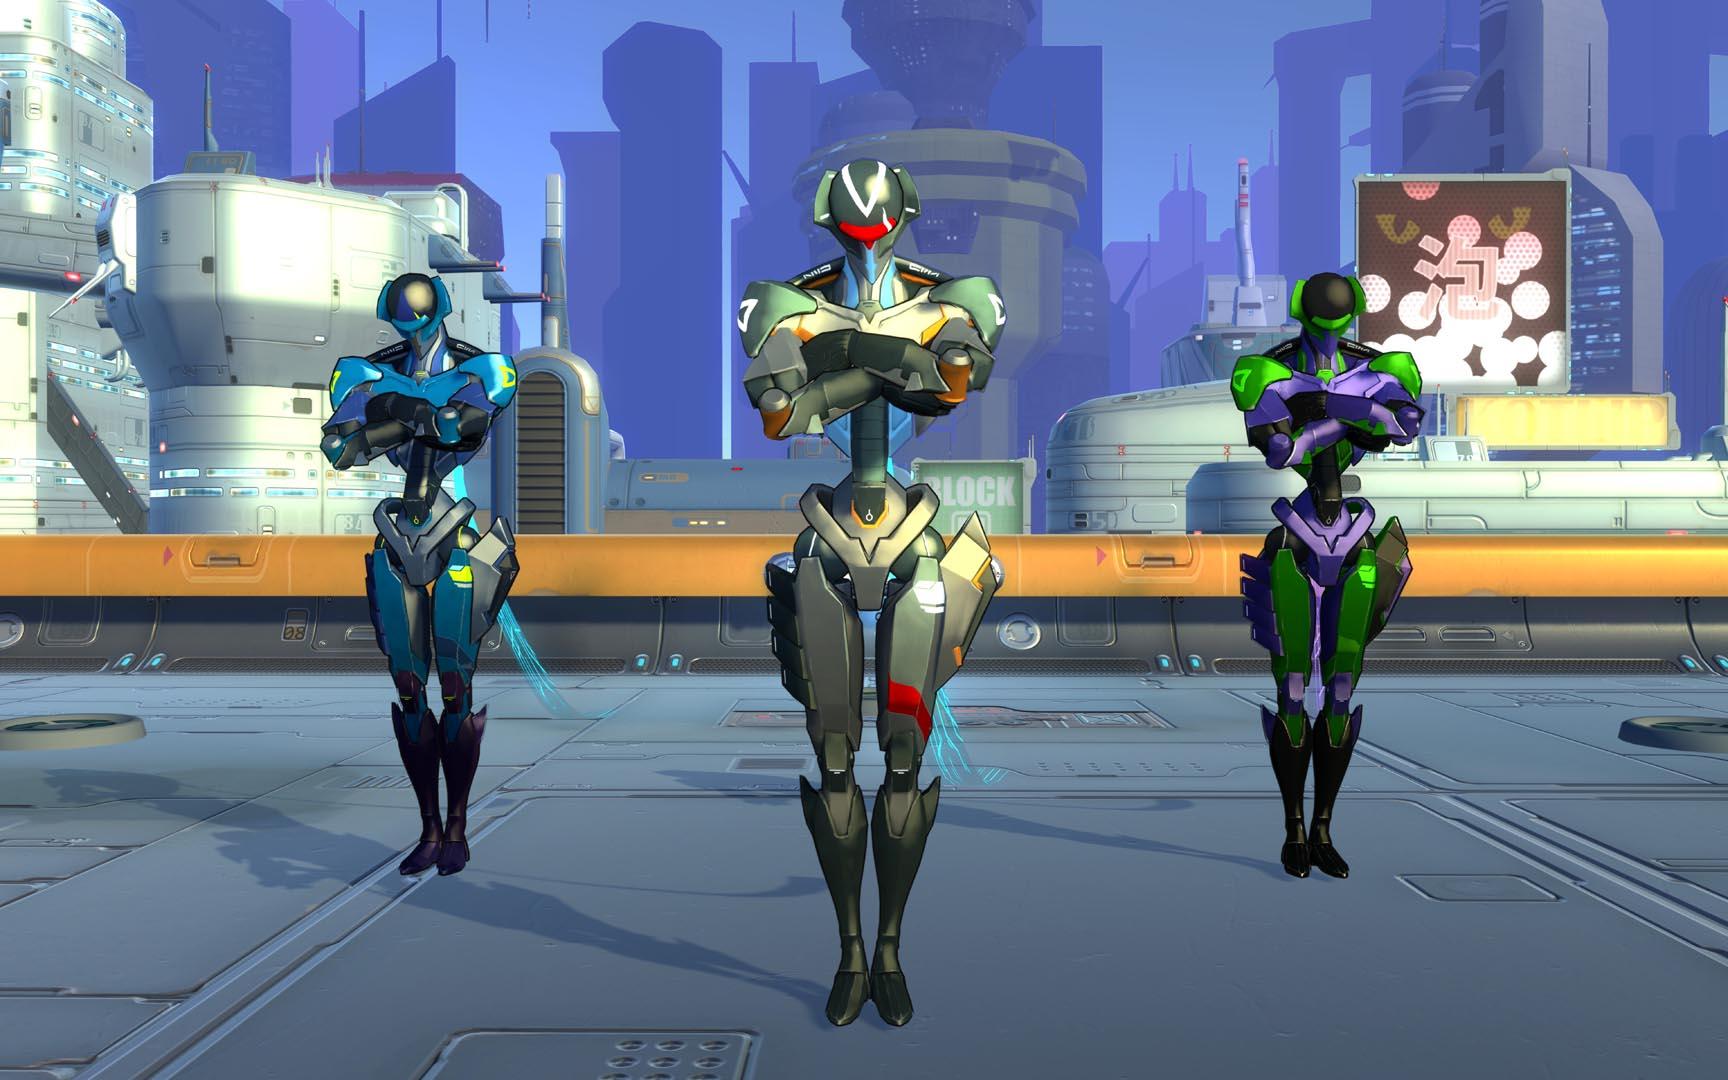 AR_CHAR_SKIN_WarforgedFreelancerSteamPack_Kaigin_Robot_Lineup_01_1494320212